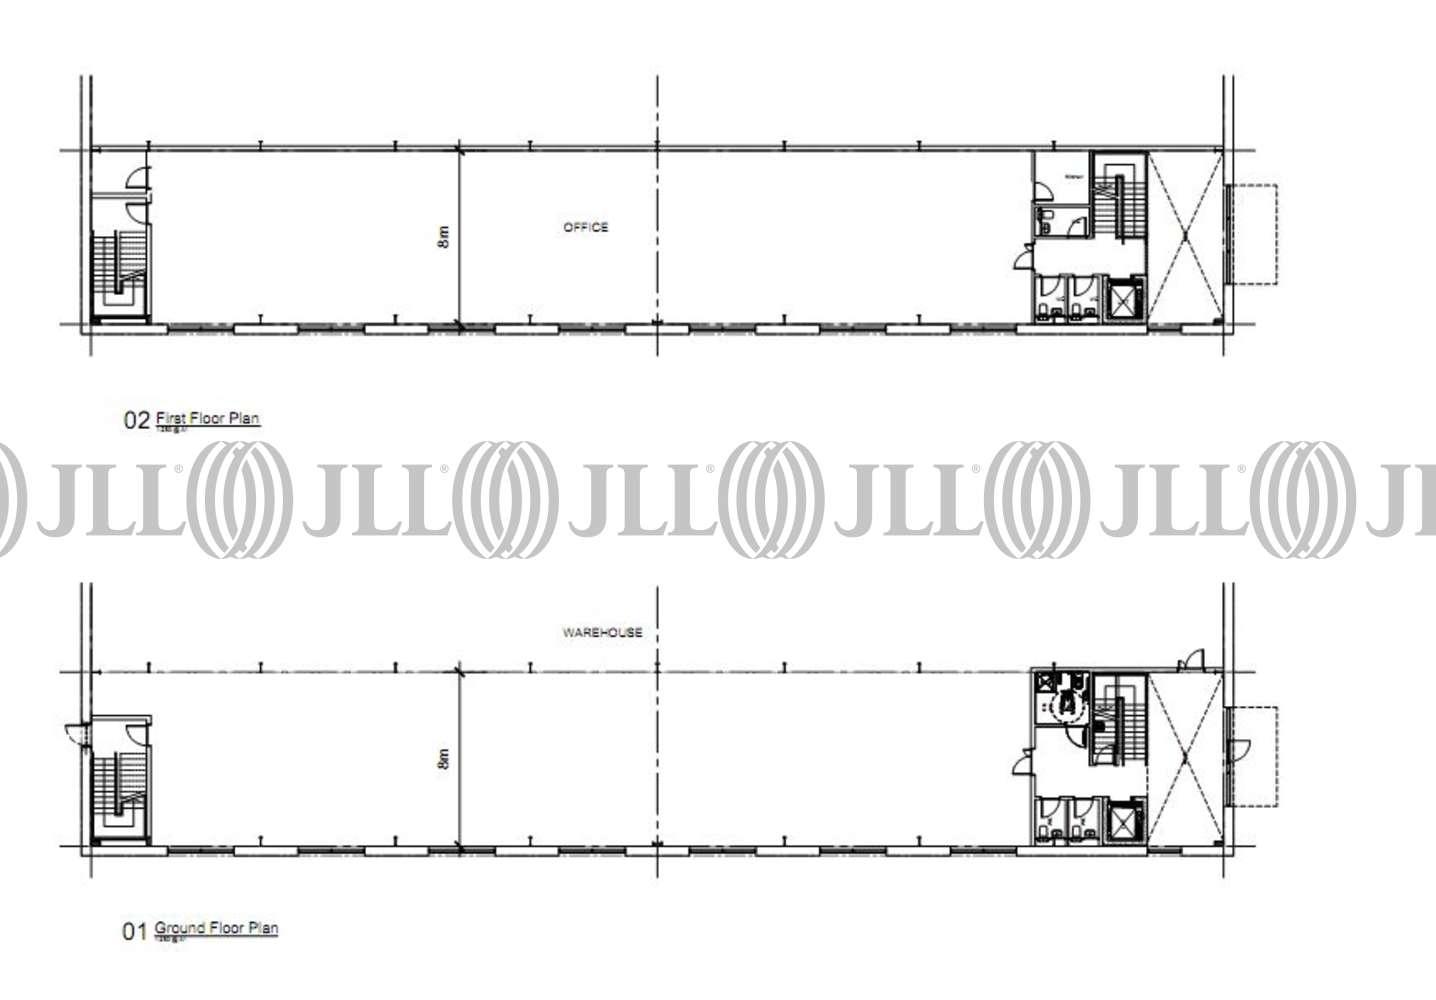 Industrial Fareham, PO15 5RJ - J9 South - 62004